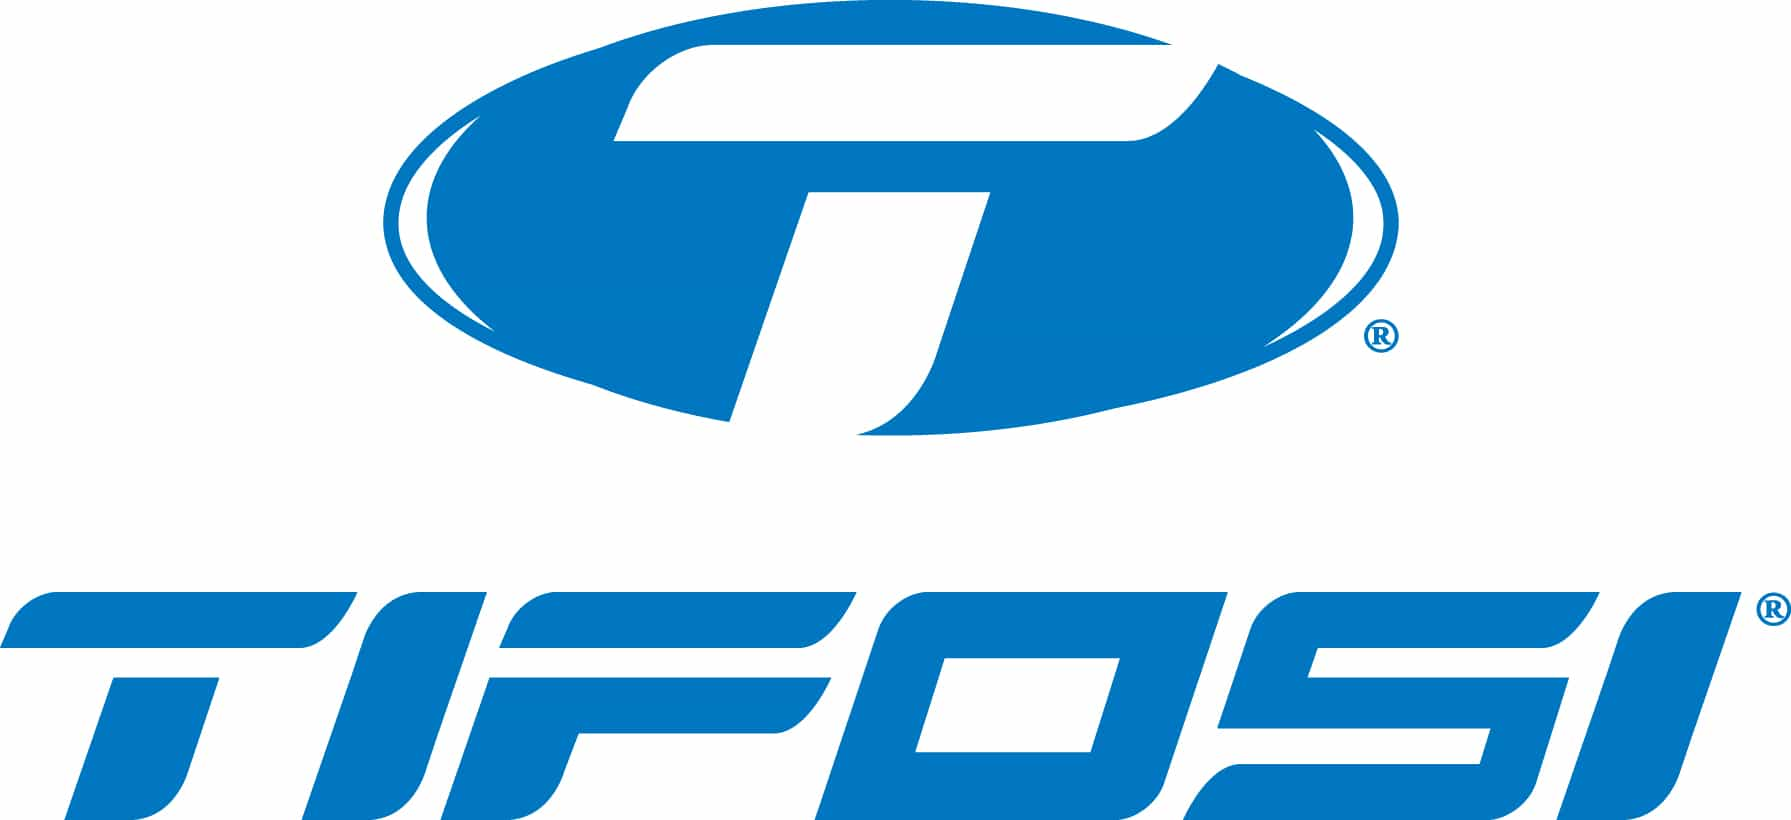 tifosi brand logo